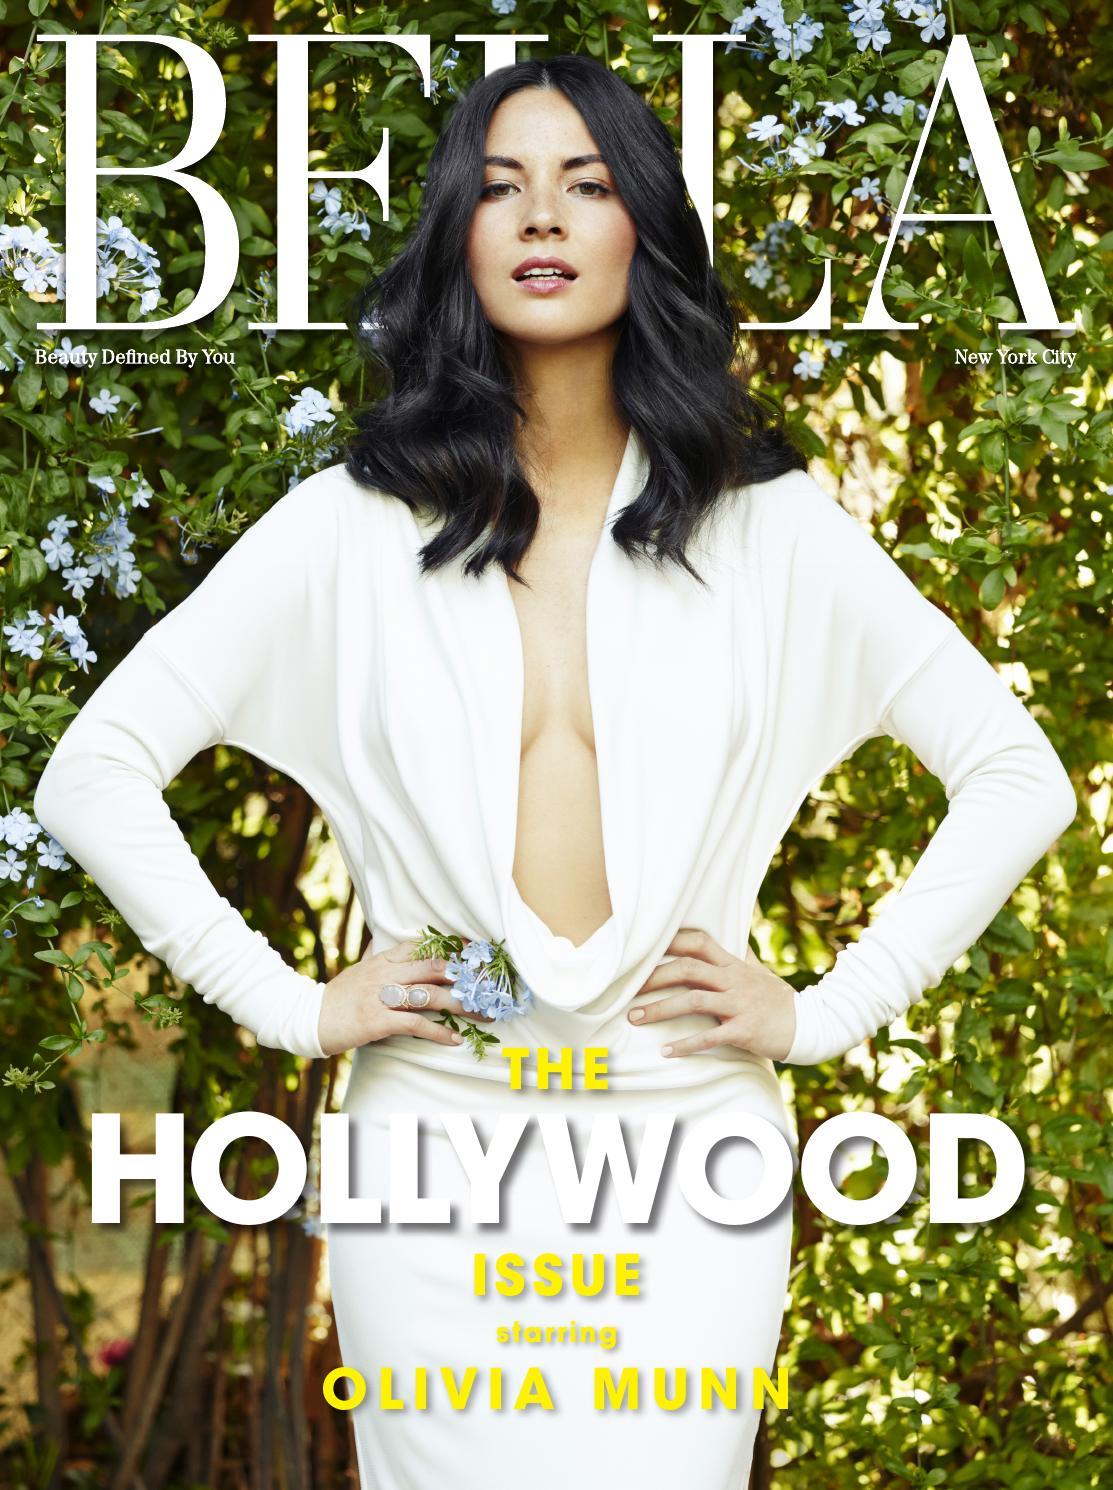 Bella Nyc Magazinethe Hollywood Issue Jan Feb 2015 By Media Krezi Kamis 32 Maybelline Super Bb Cushion Fresh Matte 03 Natural Group Issuu